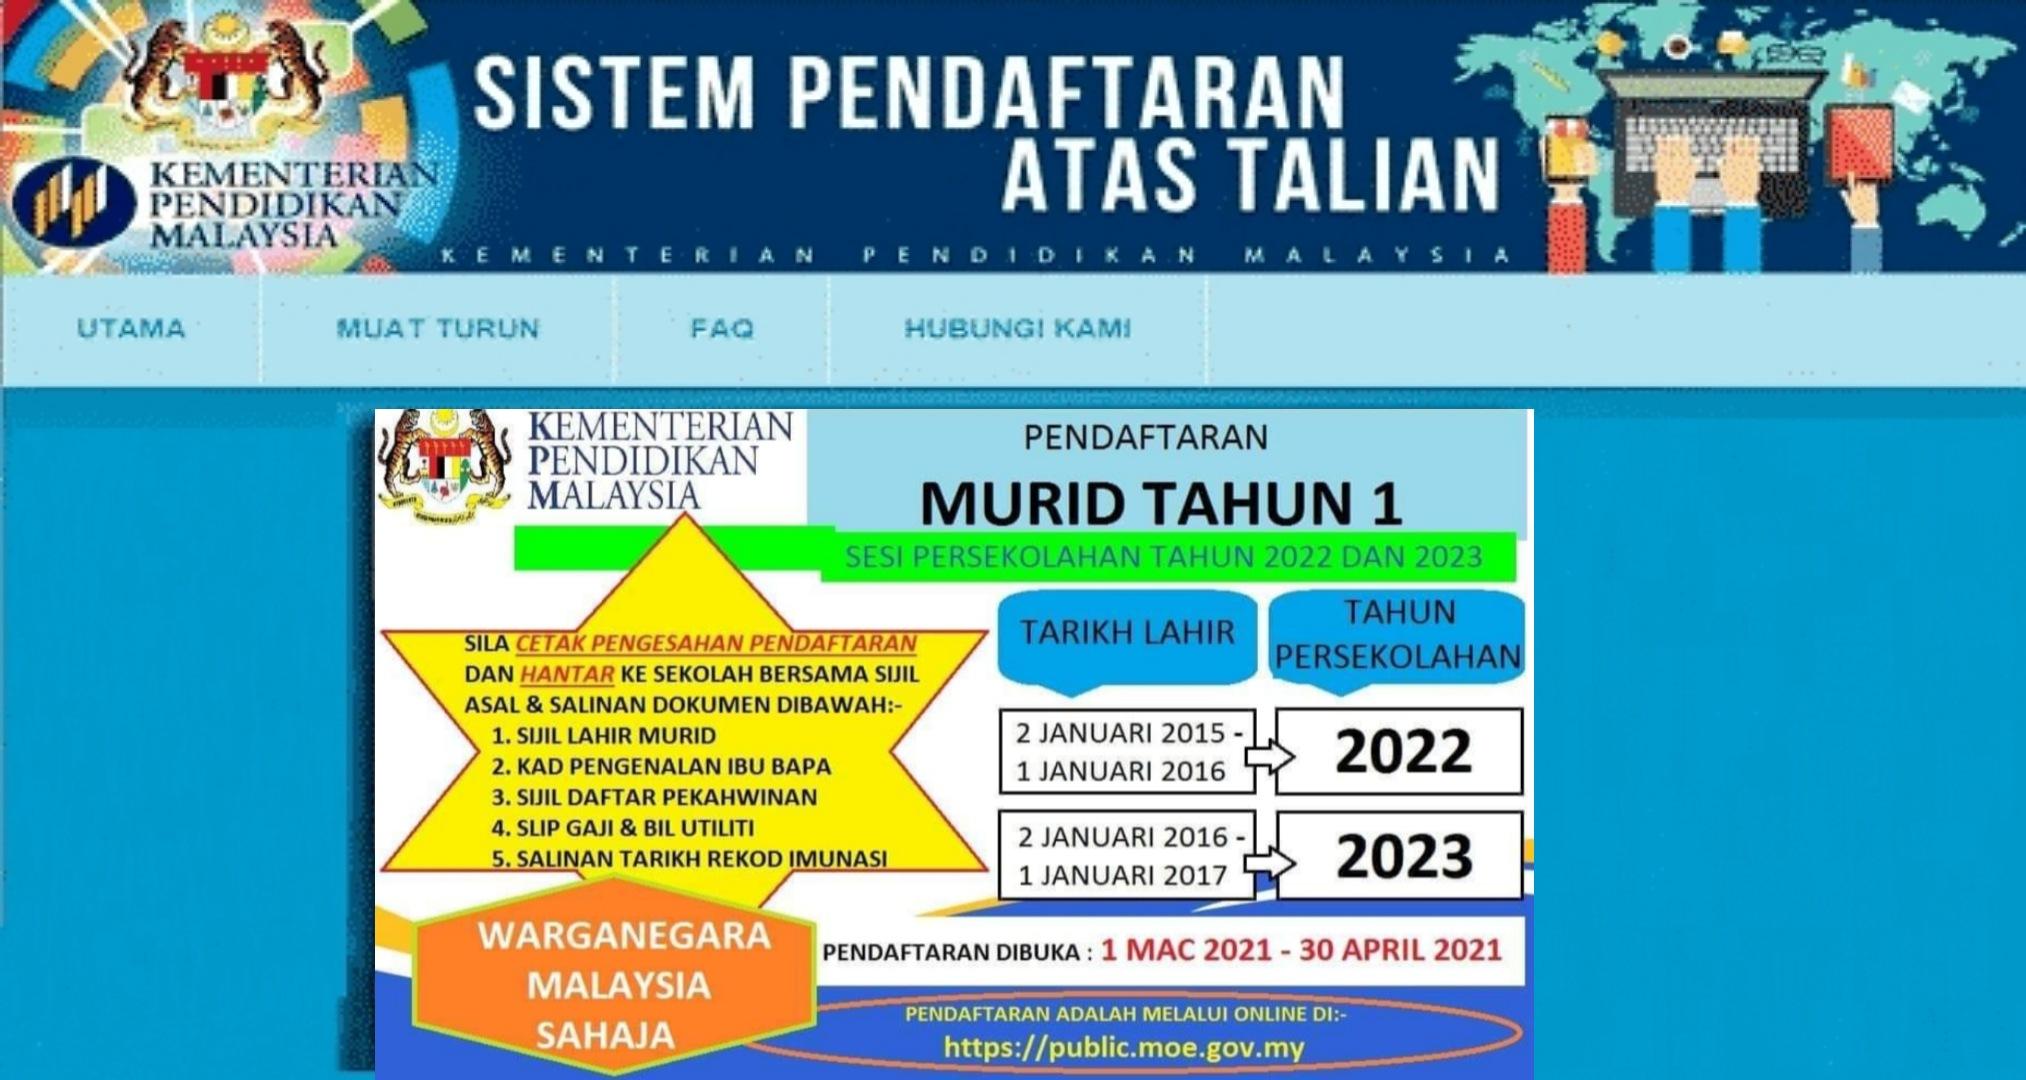 Semakan Keputusan Murid Tahun 1 2022/2023 Online (Rayuan)